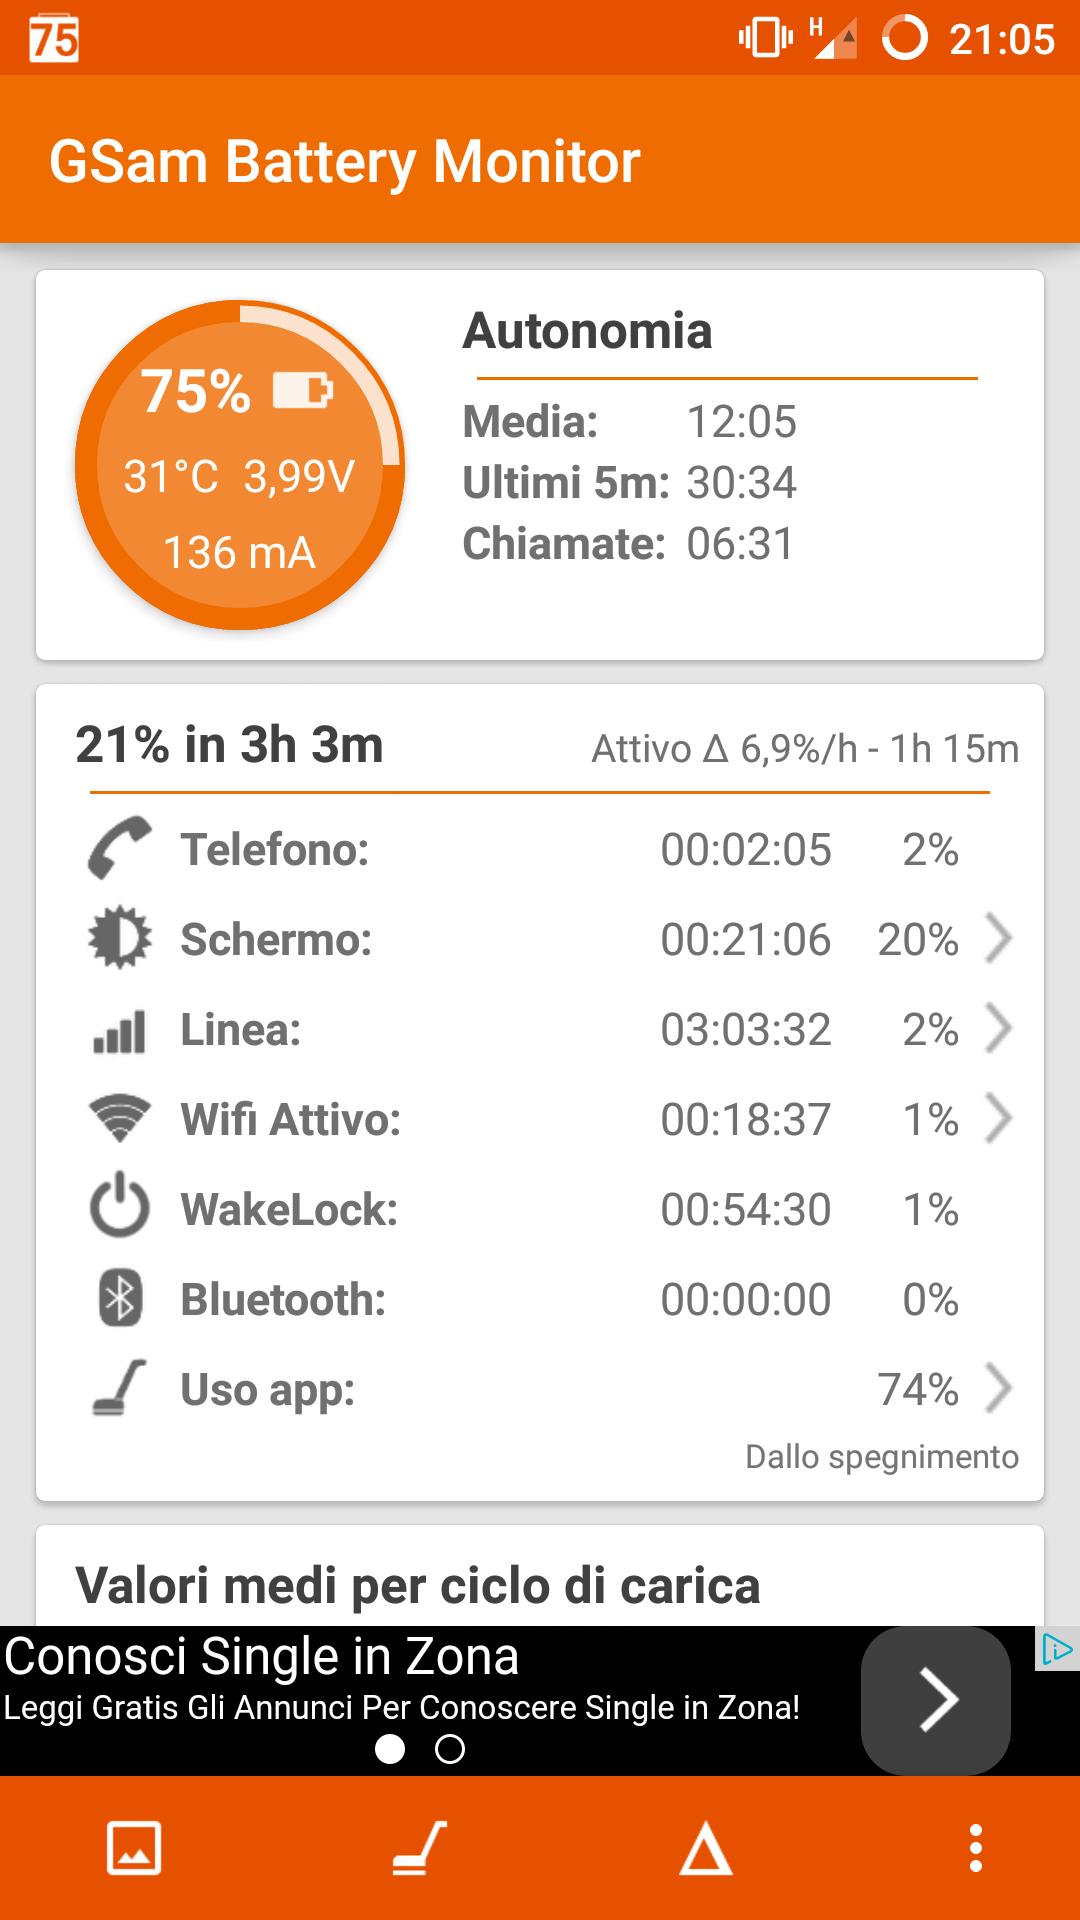 GSam Battery Monitor (1)